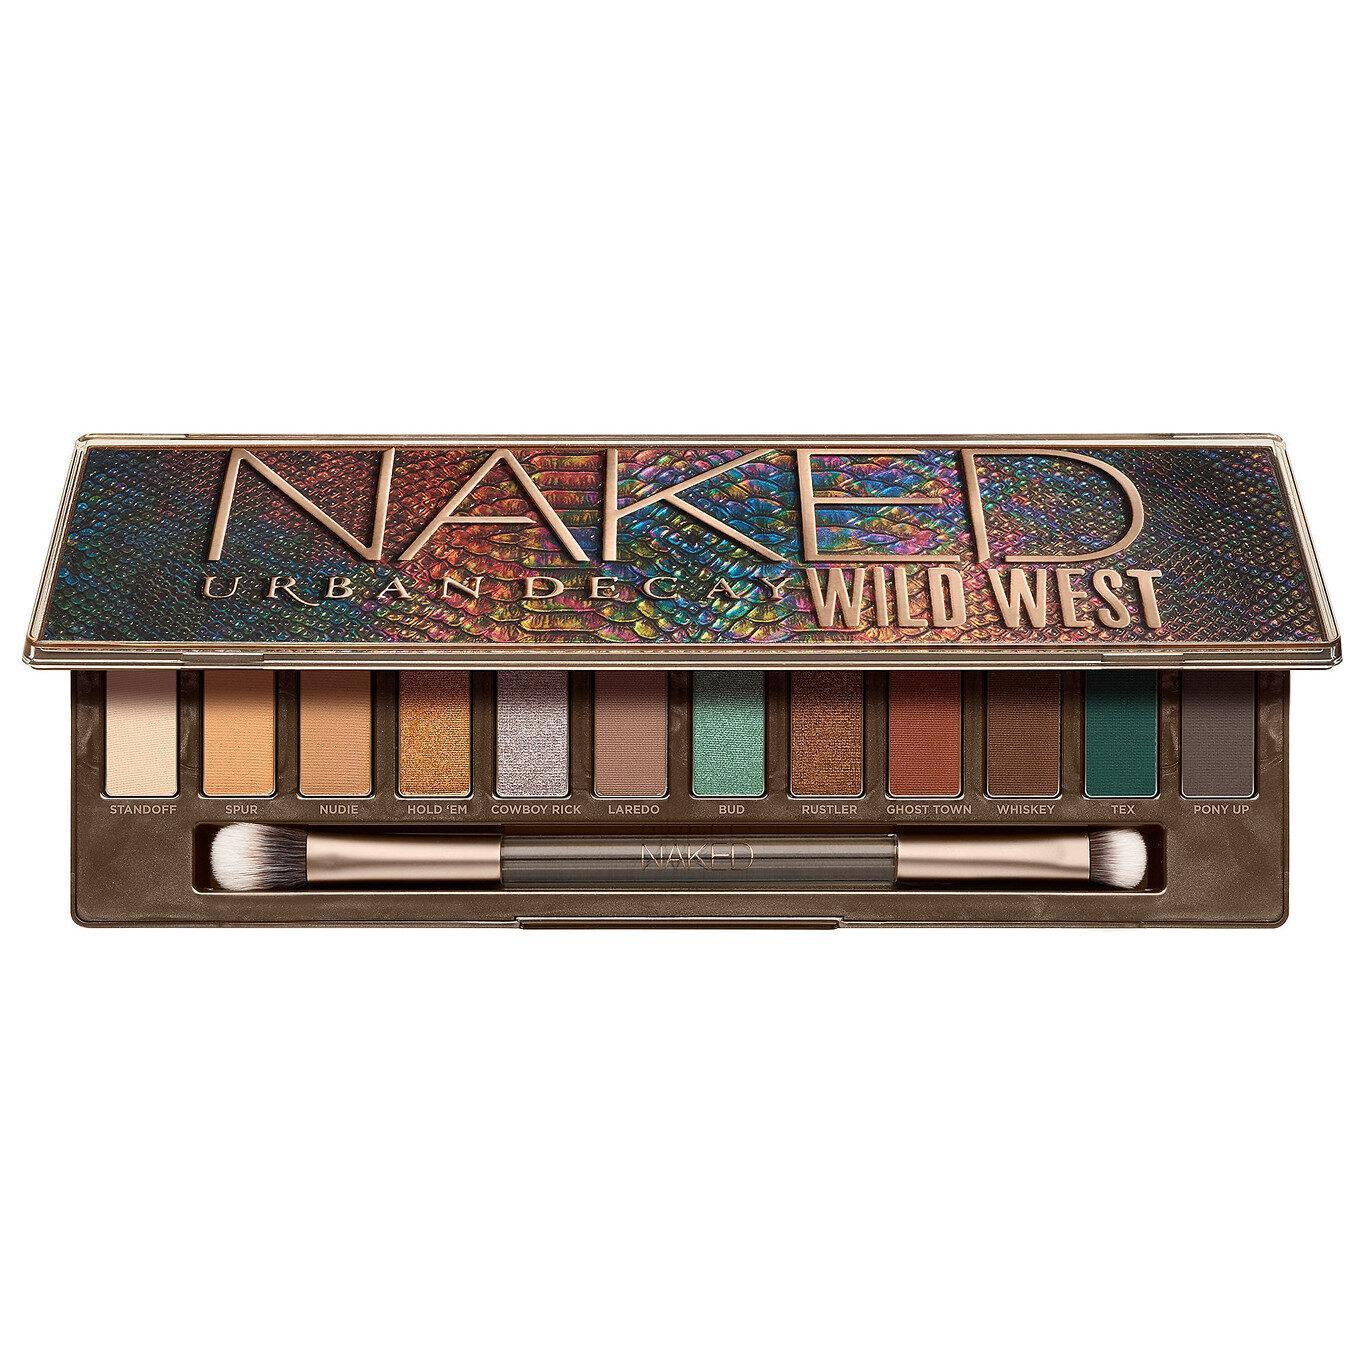 Urban Decay Naked Wild West Eyeshadow Palette Semi Open